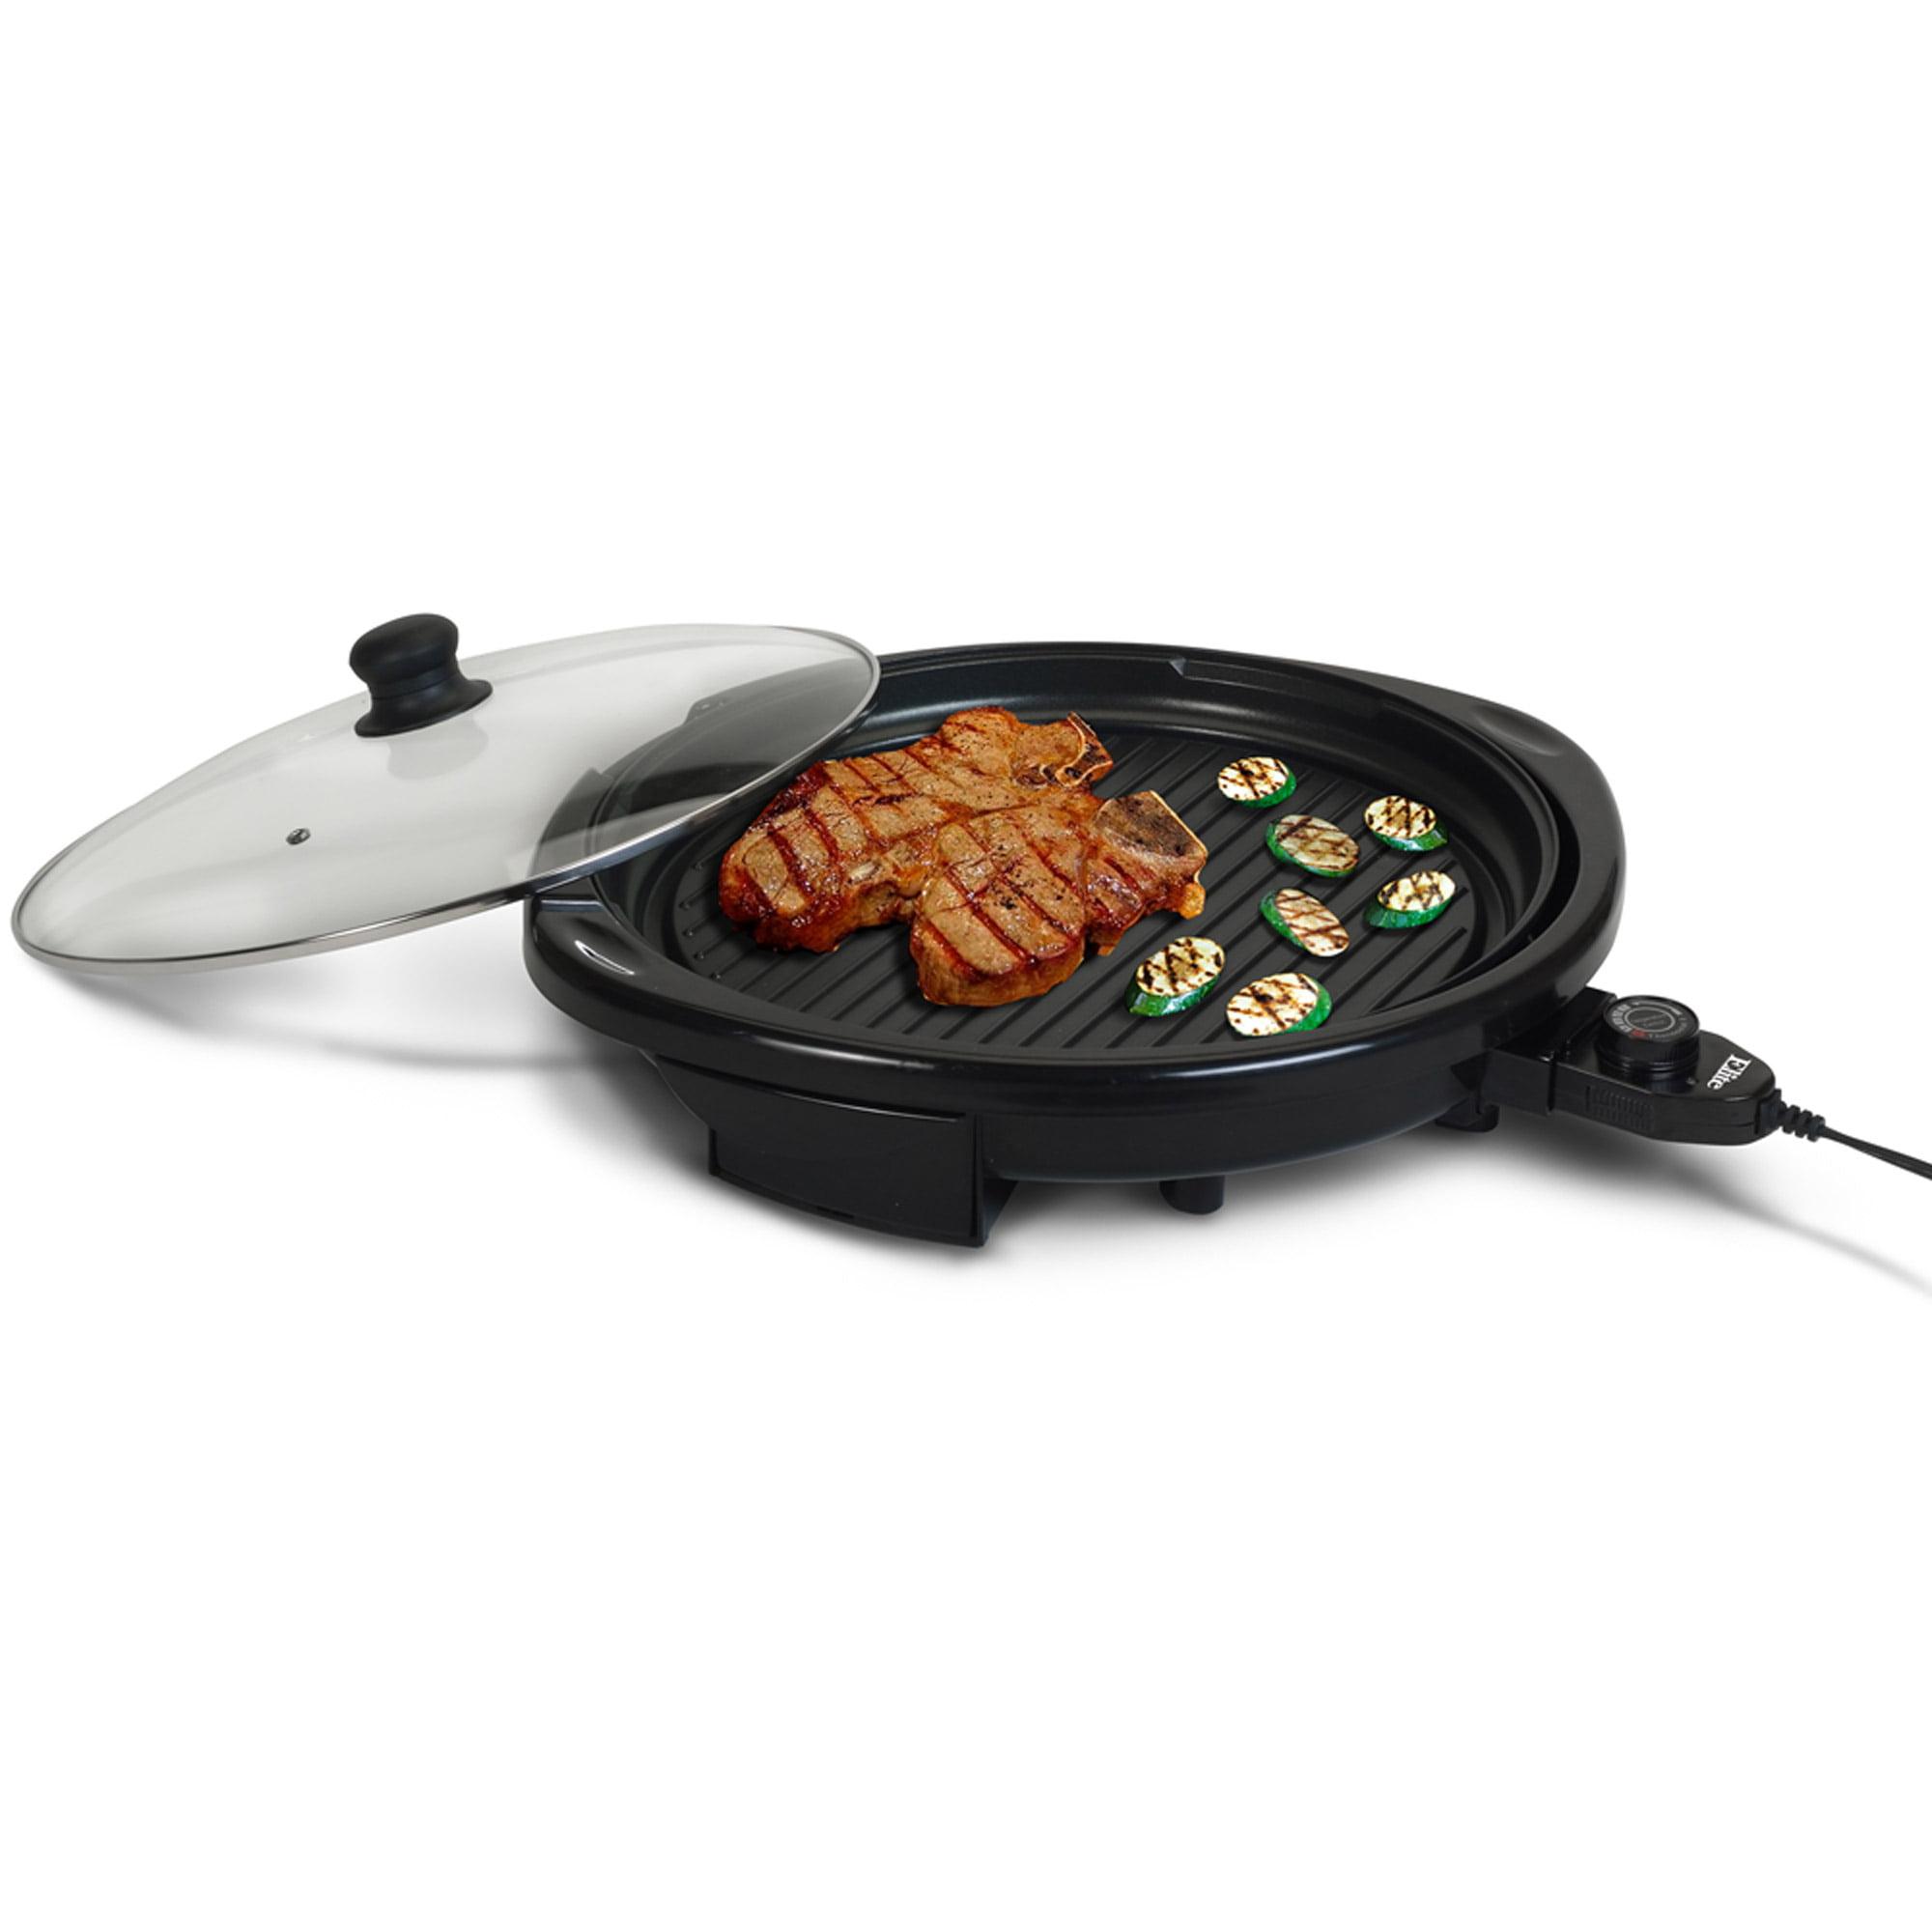 Elite Gourmet EMG-980B 14 Electric Indoor Grill, Black